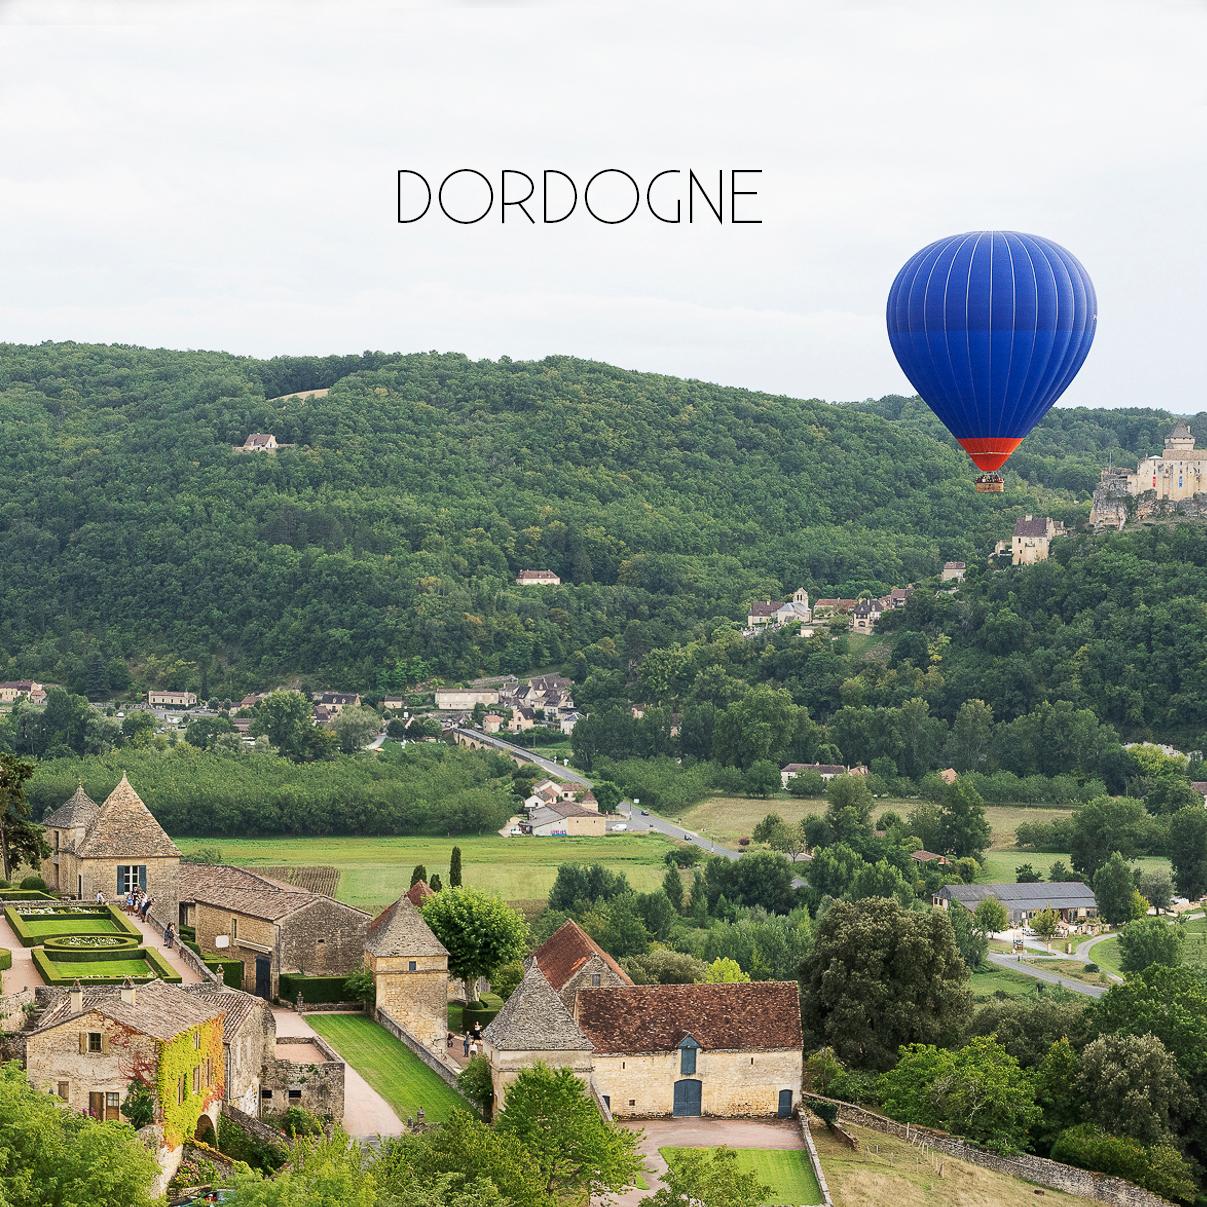 Tourisme - photographie - dordogne -Elise Fournier Photographe